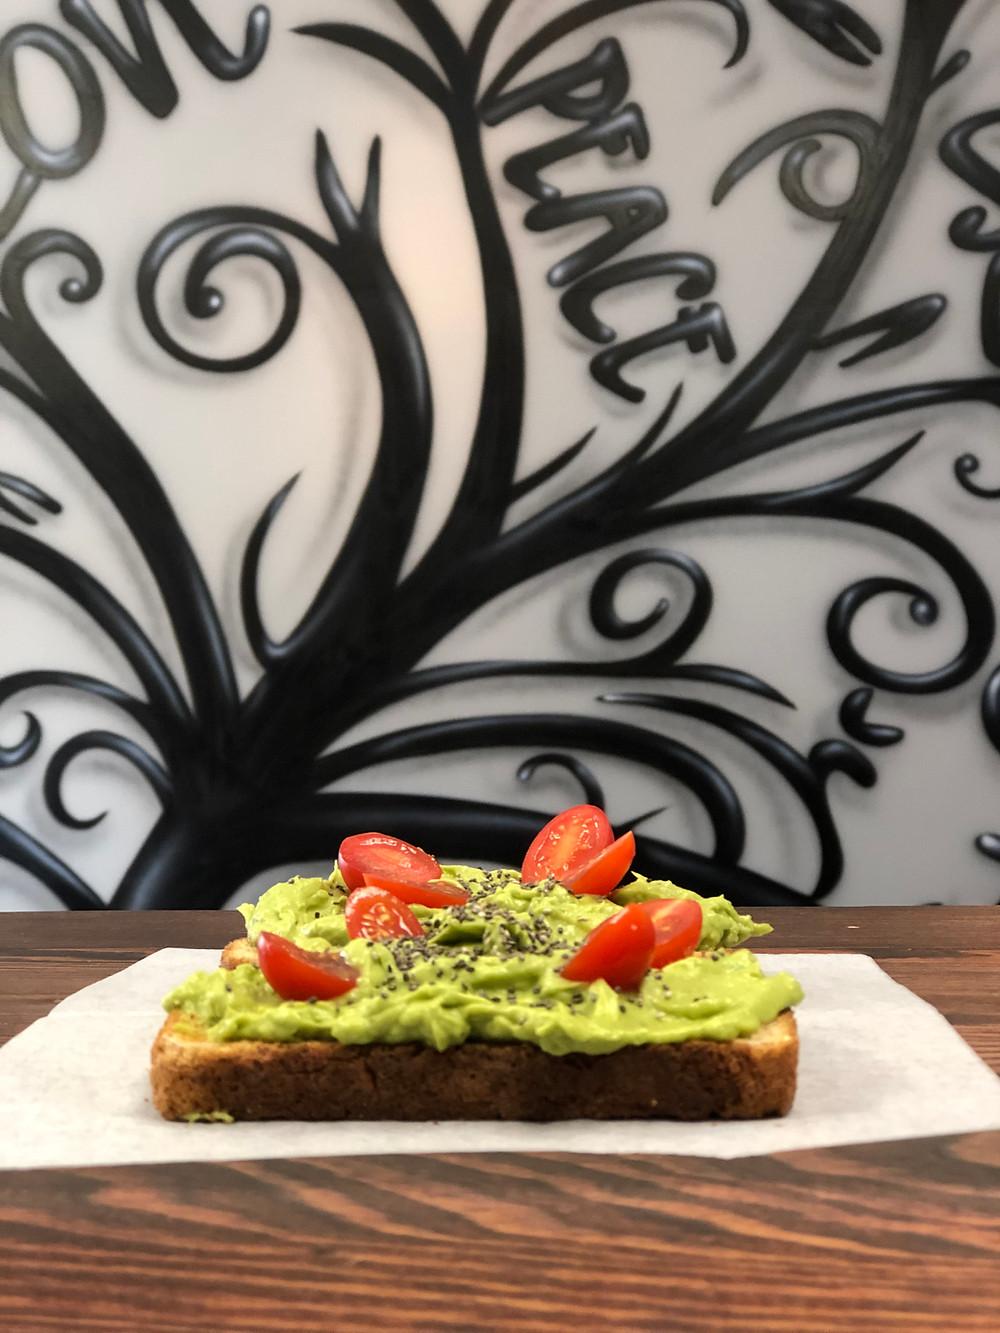 12 Grain Avocado Toast with chia seeds, tomato, balsalmic glaze